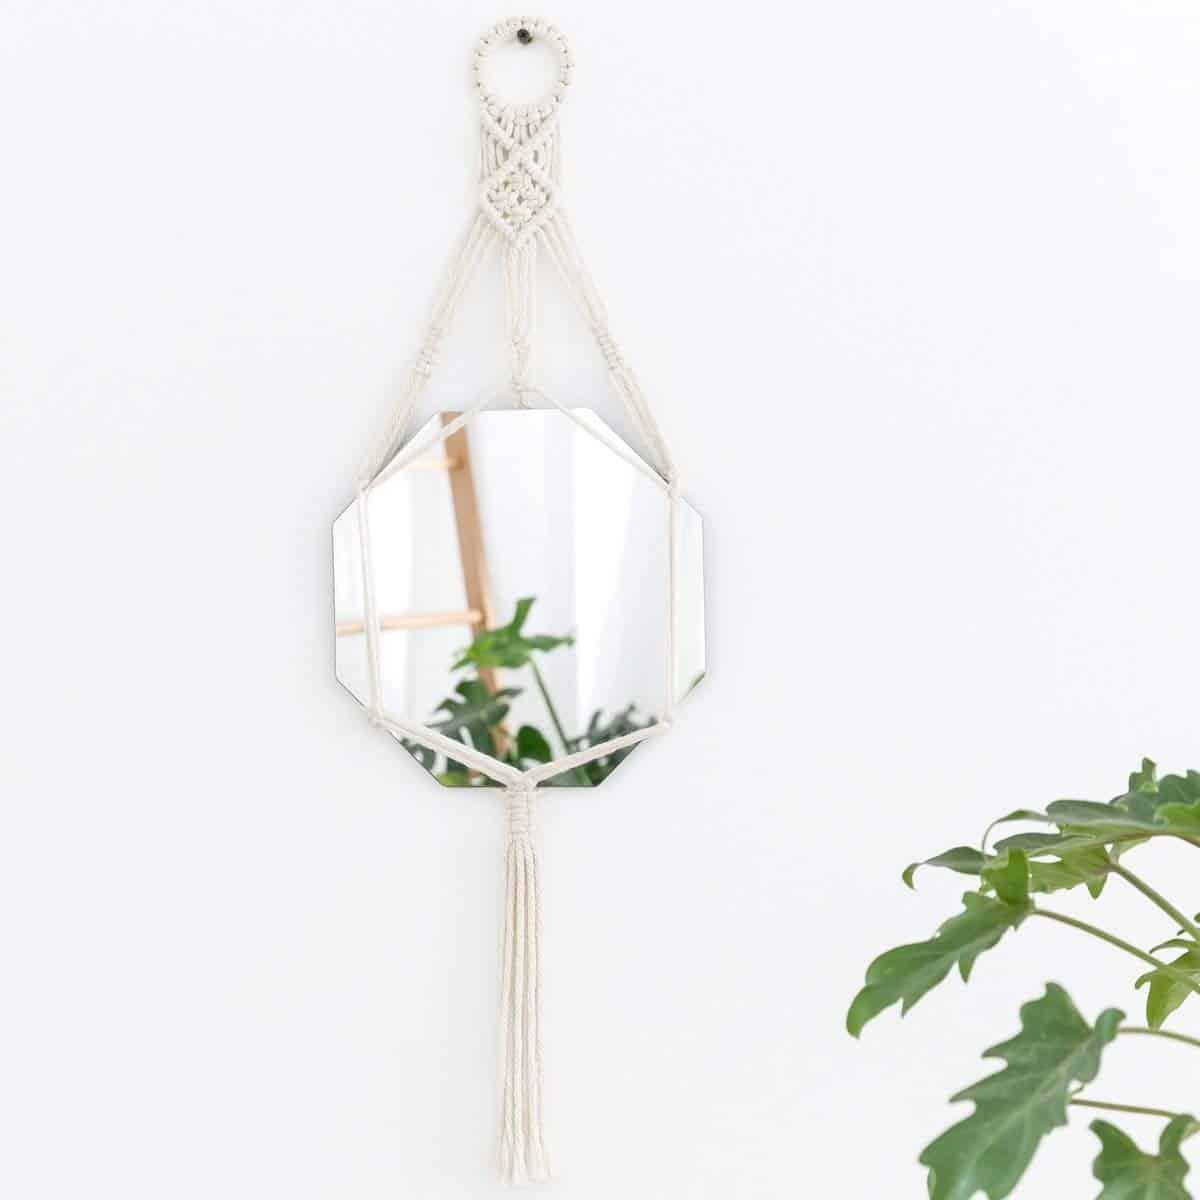 Macrame Mirror - Home Decor Ideas Amazon